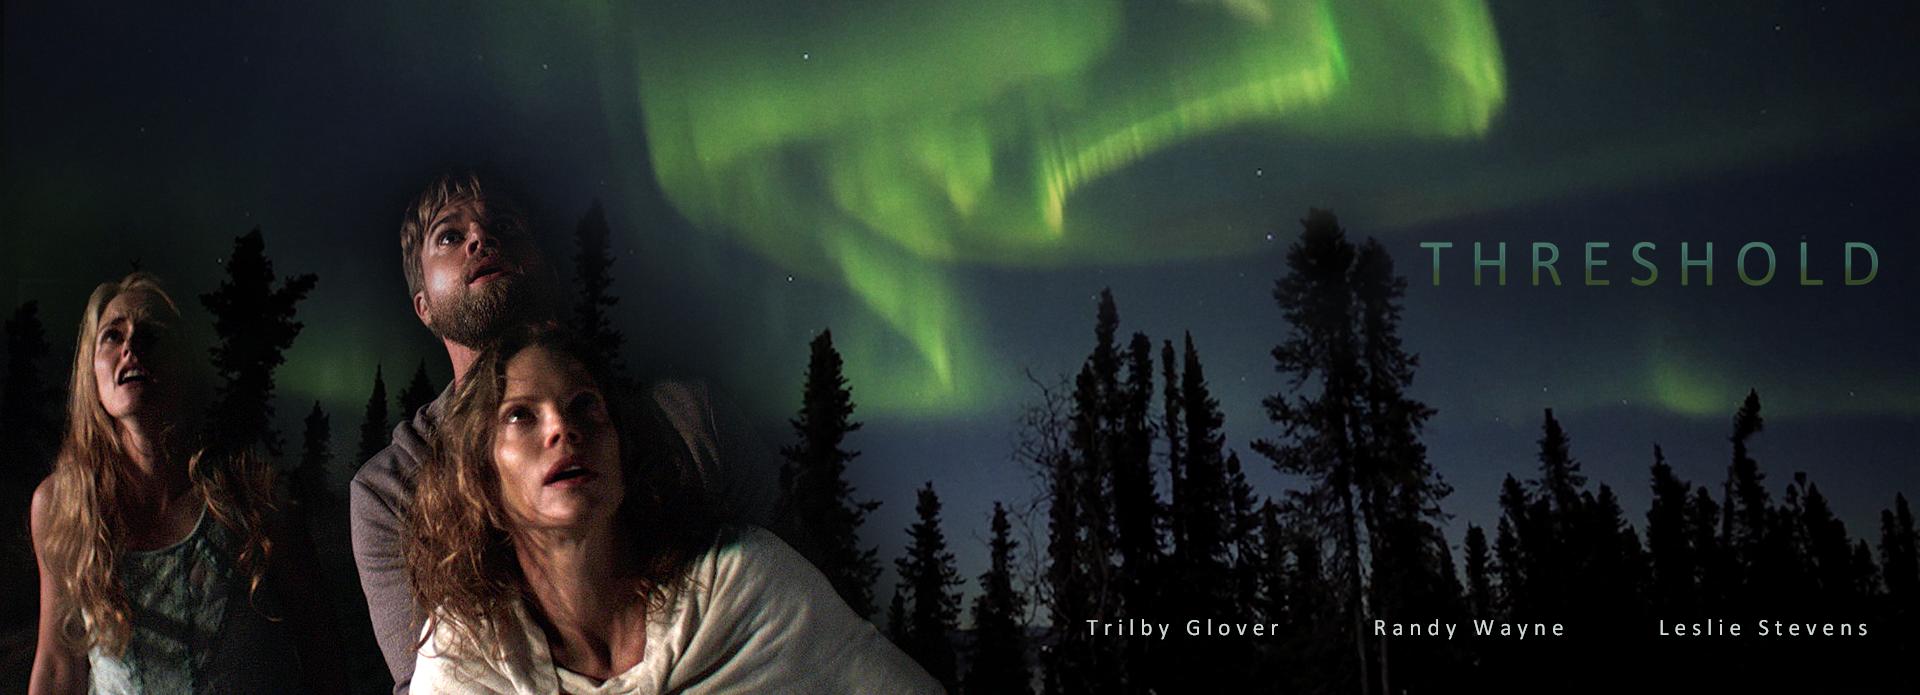 TRILBY GLOVER - RANDY WAYNE - LESLIE STEVENS                SEE TRAILER BELOW!!!     MORE STUFF - GO TO  thresholdmovie.com